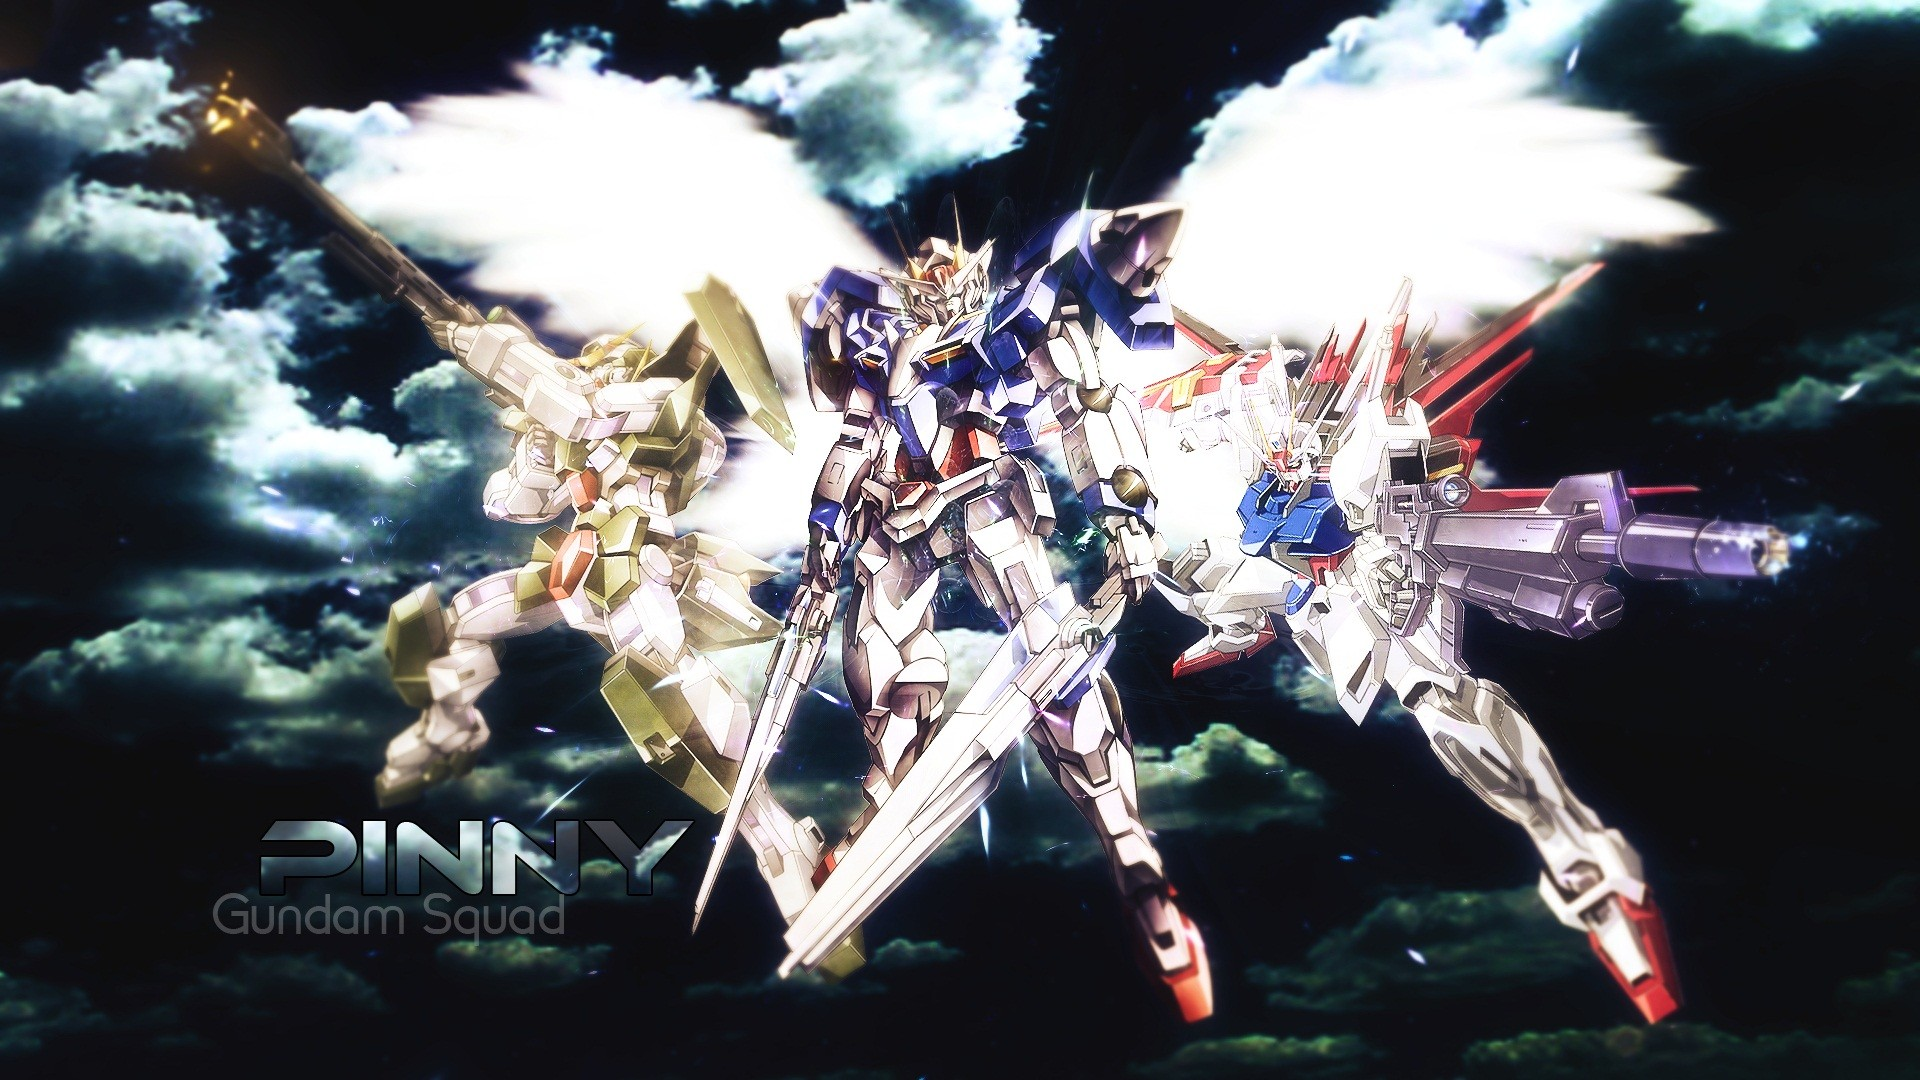 Tags: Anime, Mobile Suit Gundam Wing, Wallpaper, HD Wallpaper, Fanmade  Wallpaper